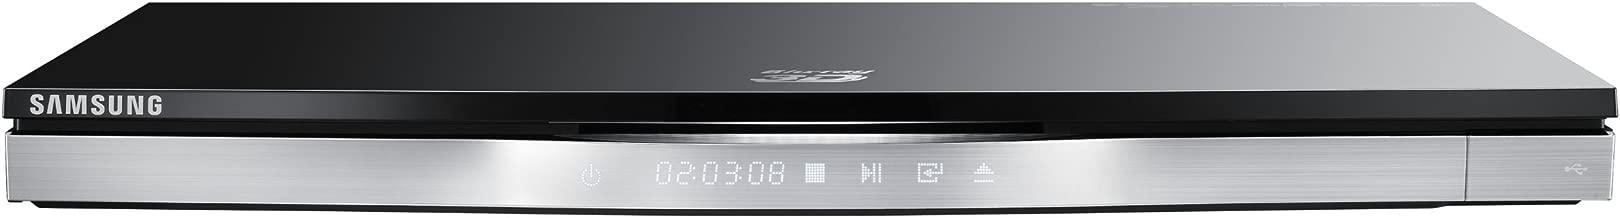 Samsung BD-E6500 3D WiFi Blu-ray Disc Player (Black) (Old Version)